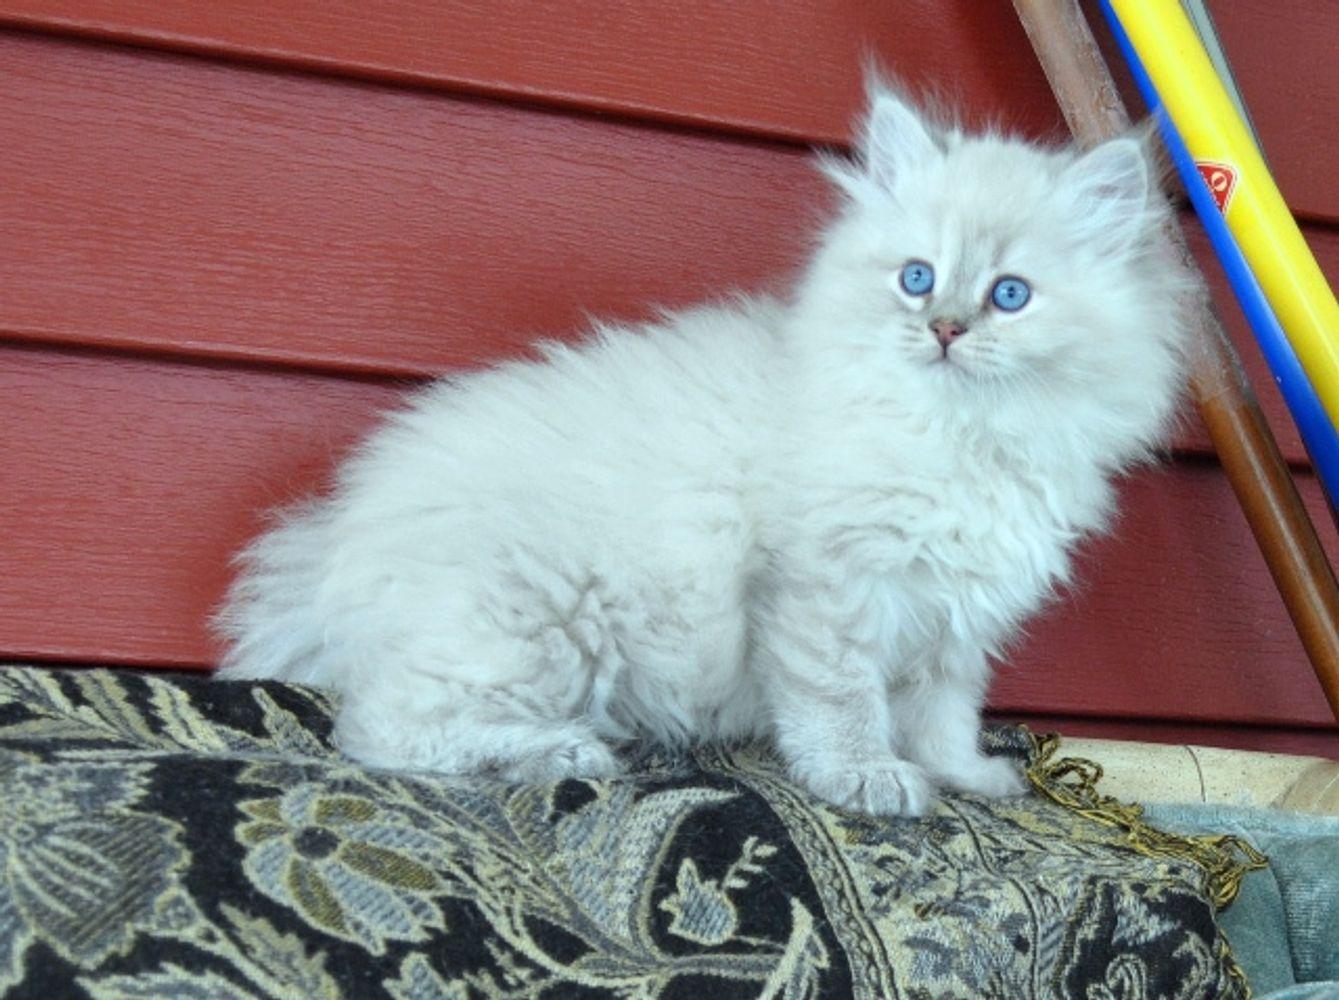 Oxsana Siberian Cats Hypoallergenic cats, hypoallergenic